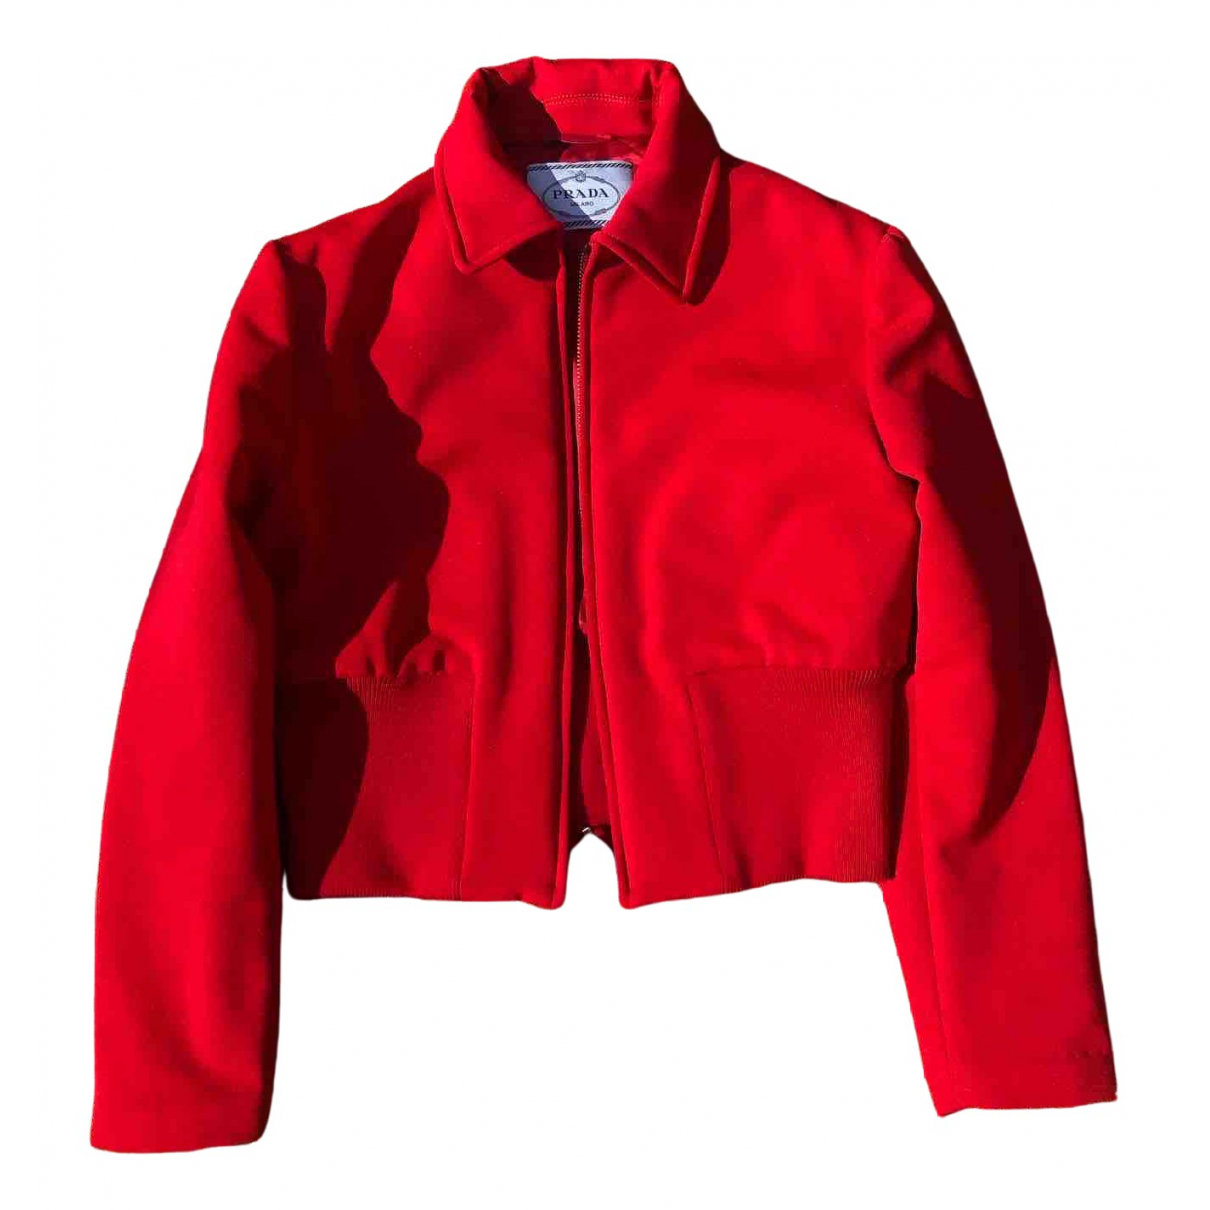 Prada \N Jacke in  Rot Wolle